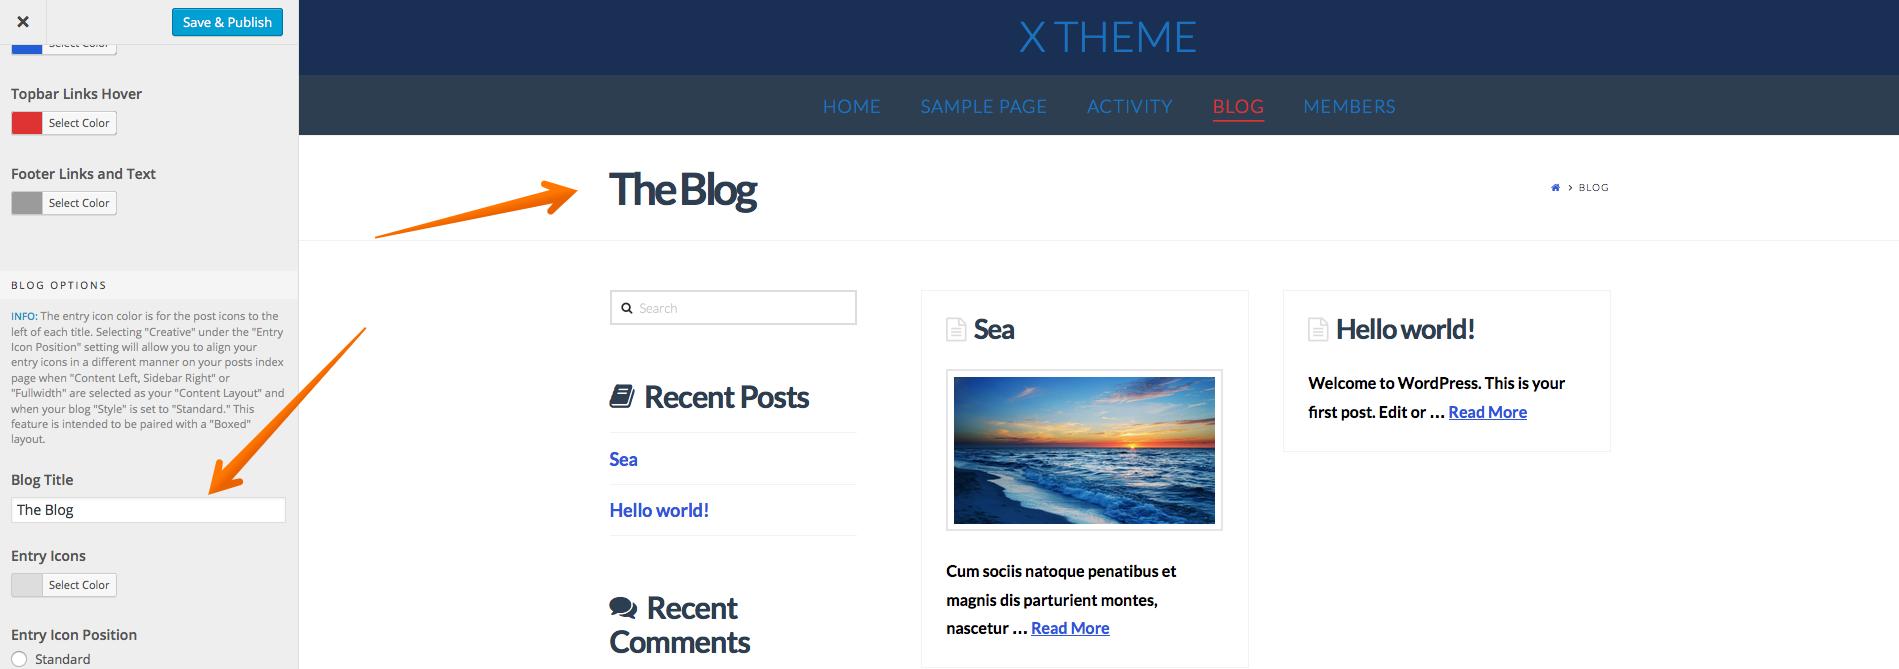 Set Blog title